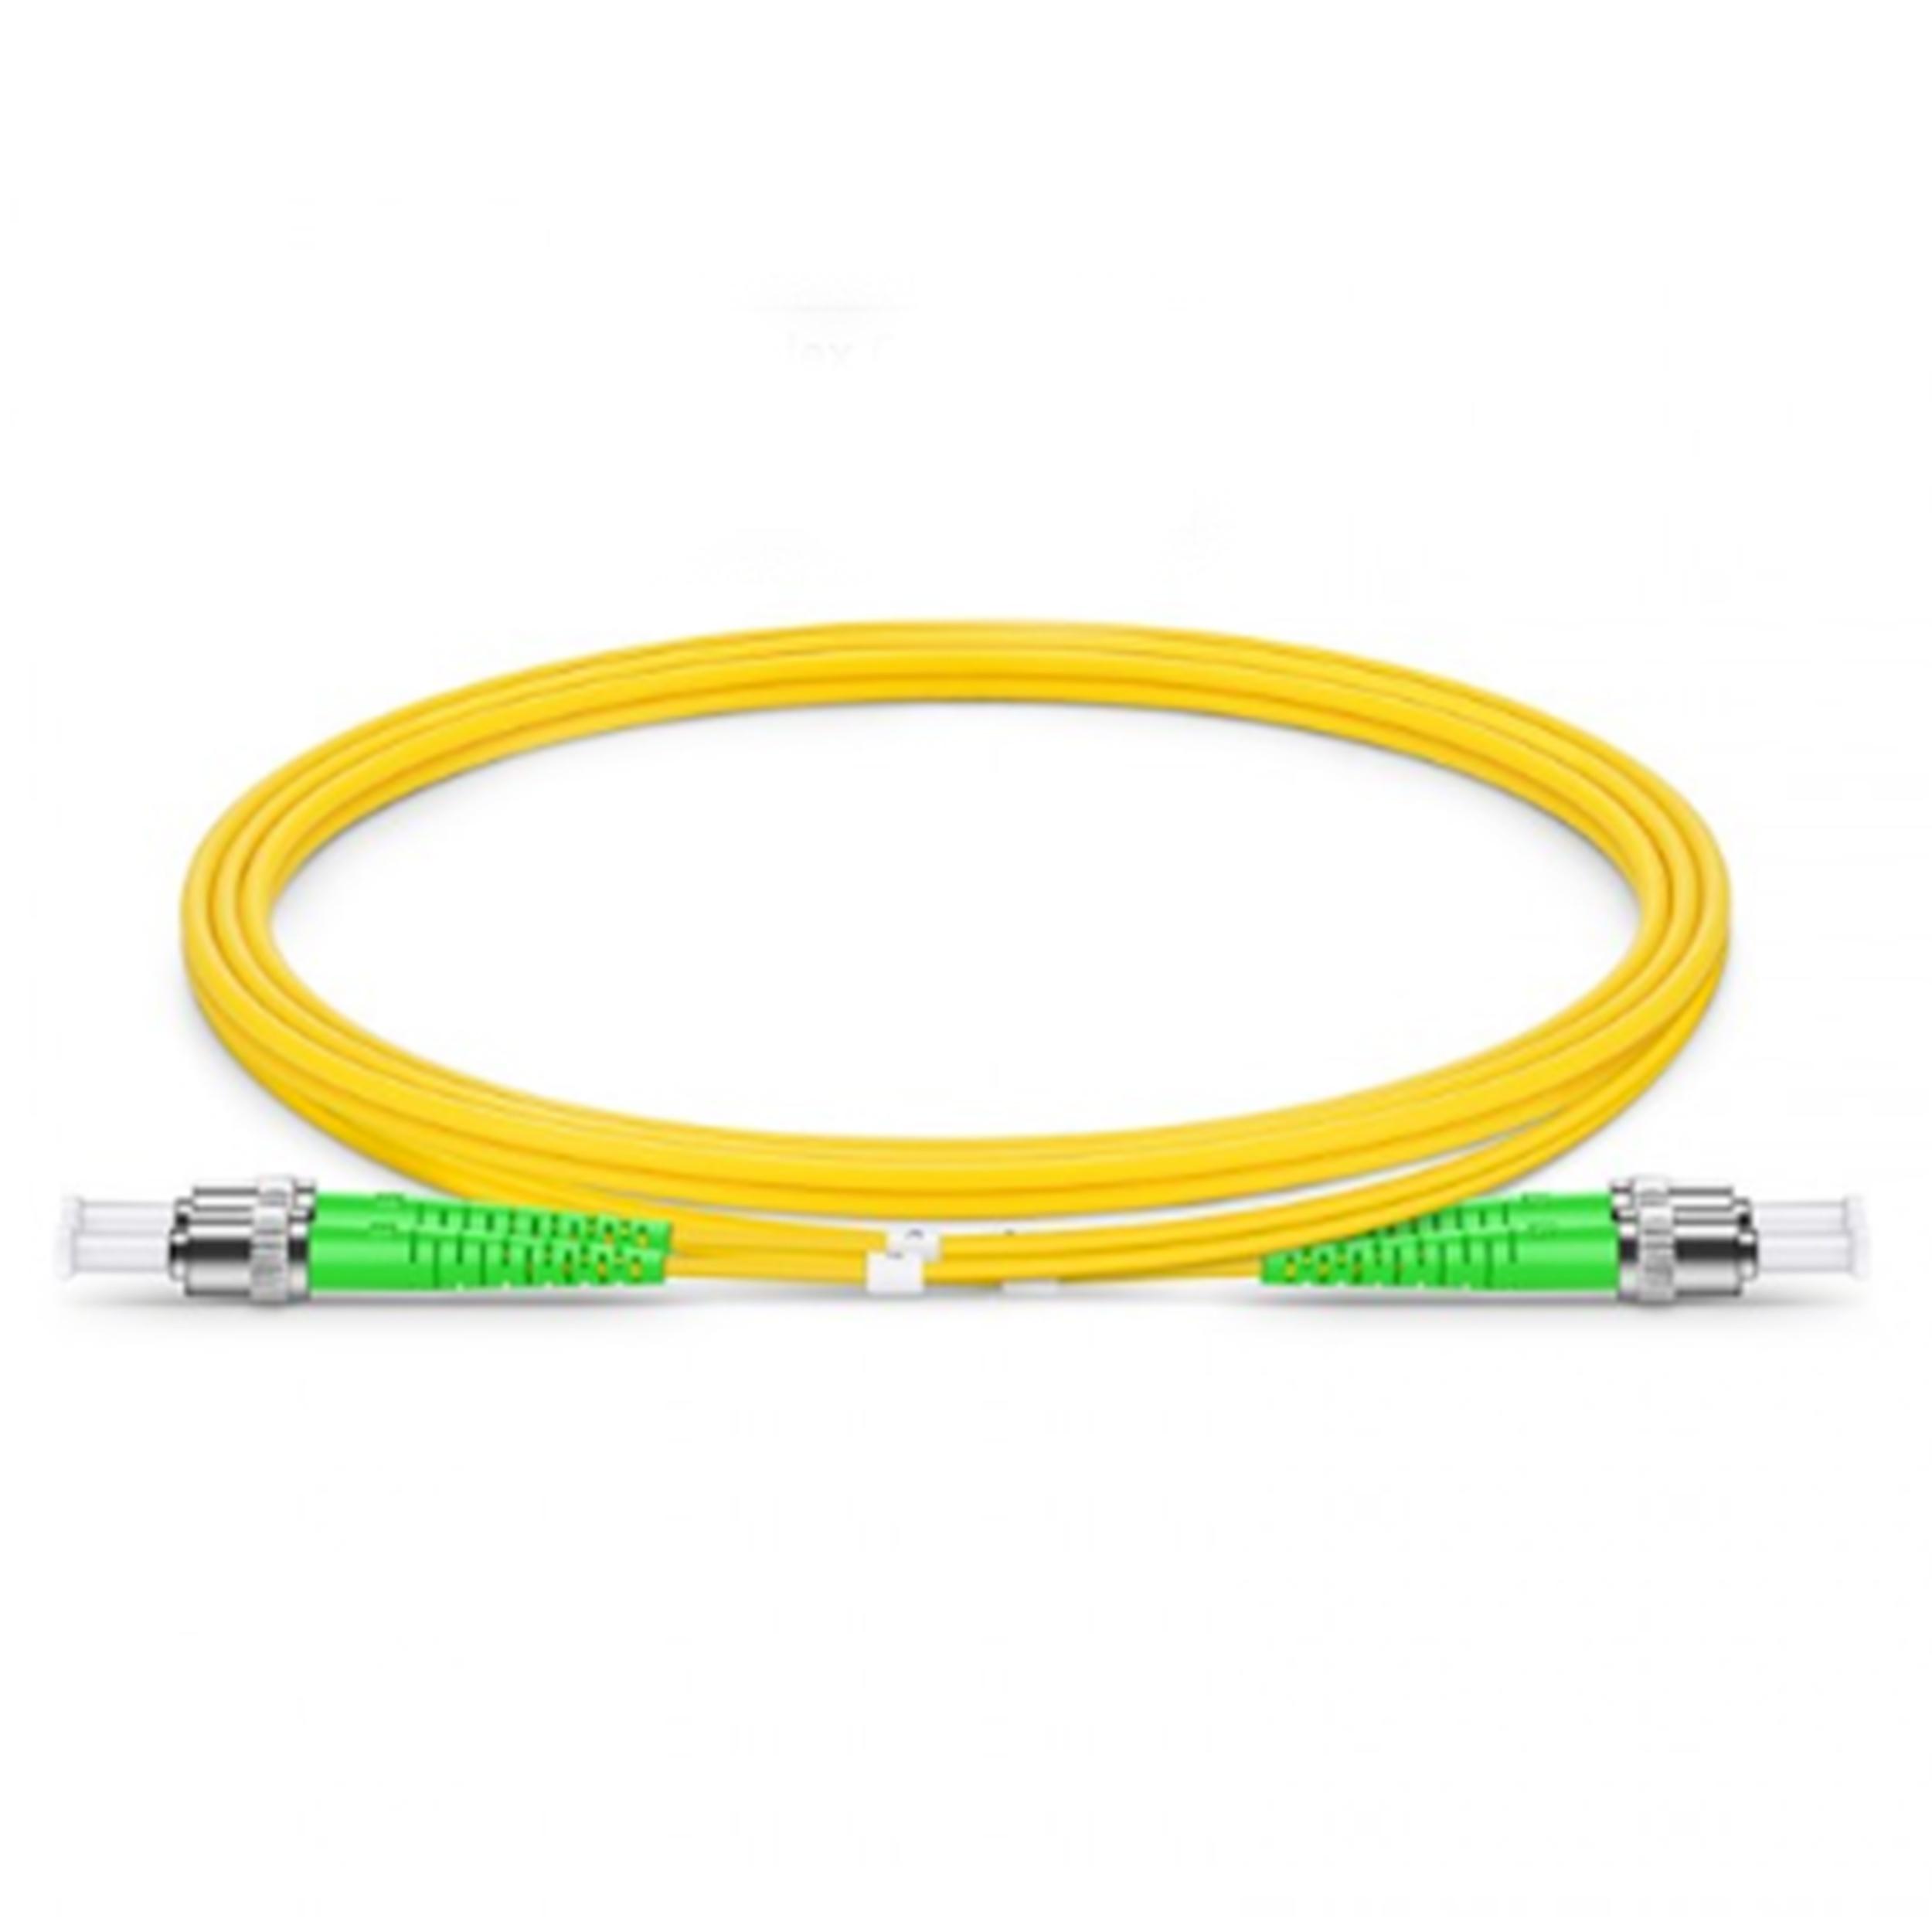 OS2 ST APC to ST APC 2.00mm Singlemode Duplex Fiber Optic Cable 5 Meter (16ft) Yellow